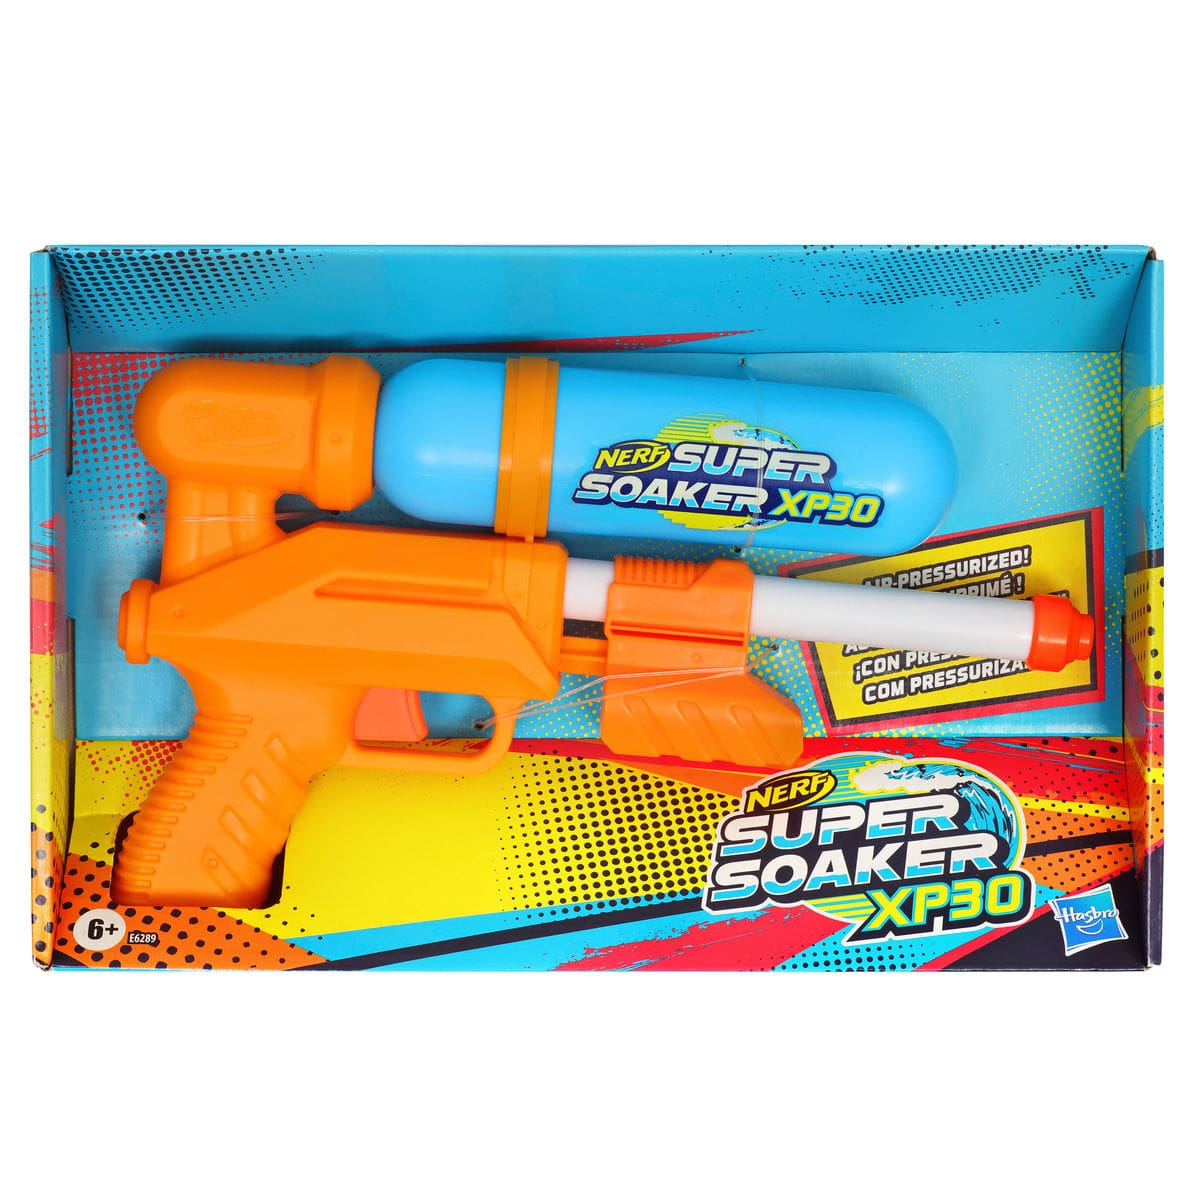 Nerf Super Soaker 30XP